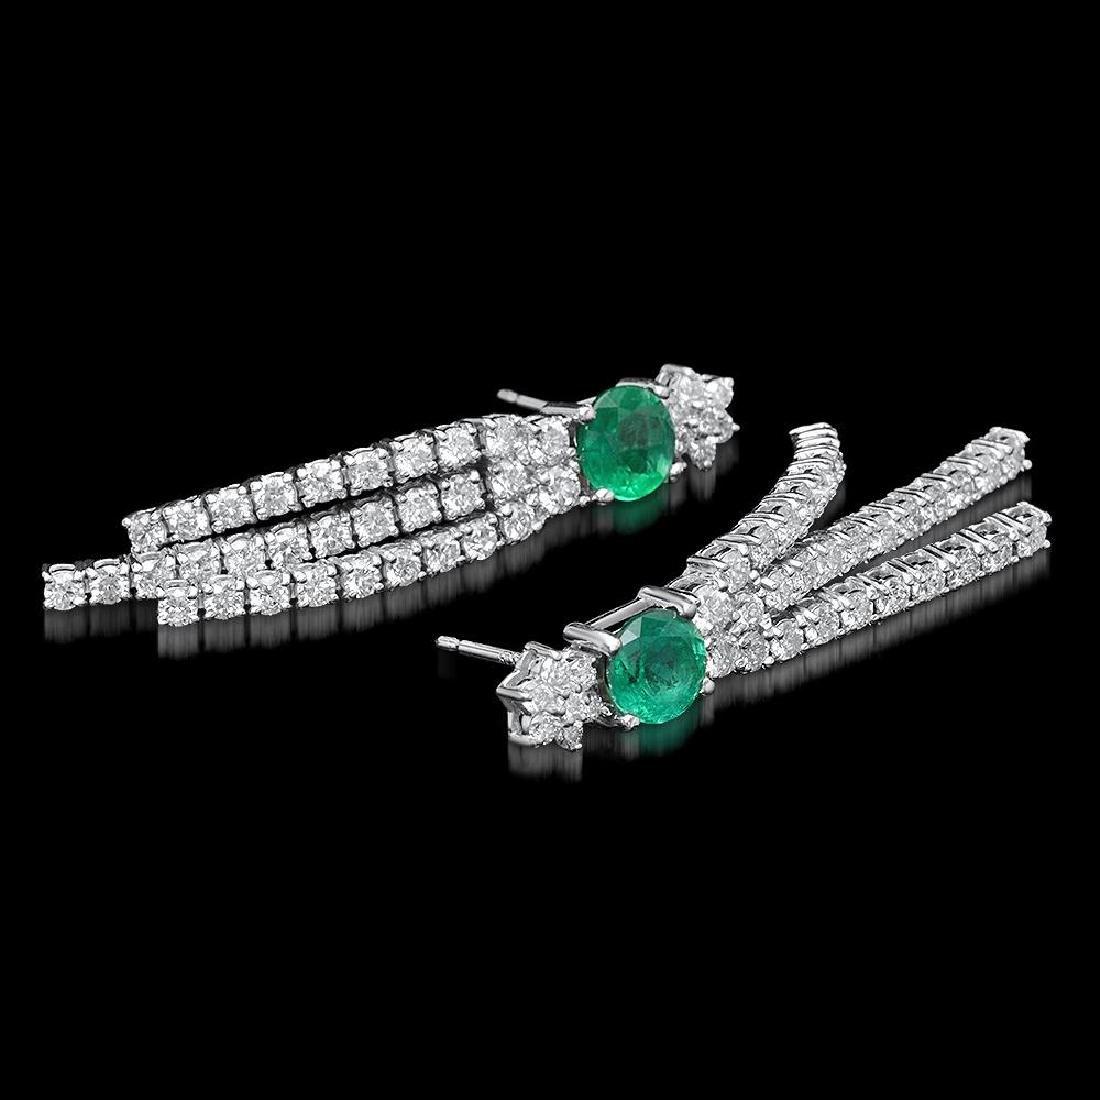 14k White Gold 1.70ct Emerald 2.62ct Diamond Earrings - 2